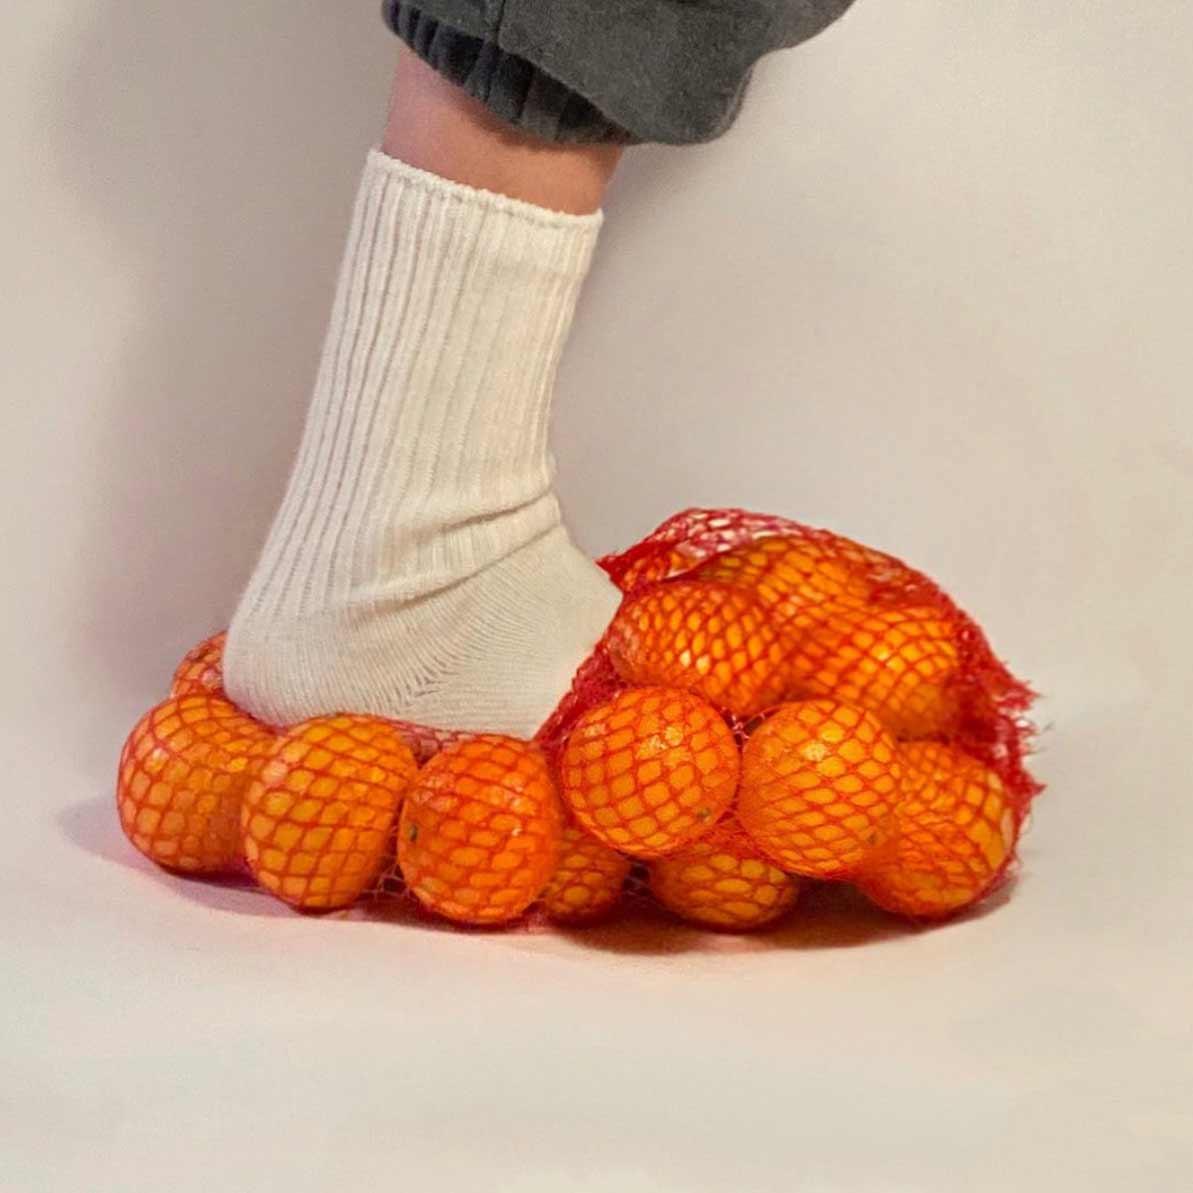 Gummibären-Hose, Sushi-Schlappen oder Waffel-Weste Nicole-McLaughlin-food-fashion_06